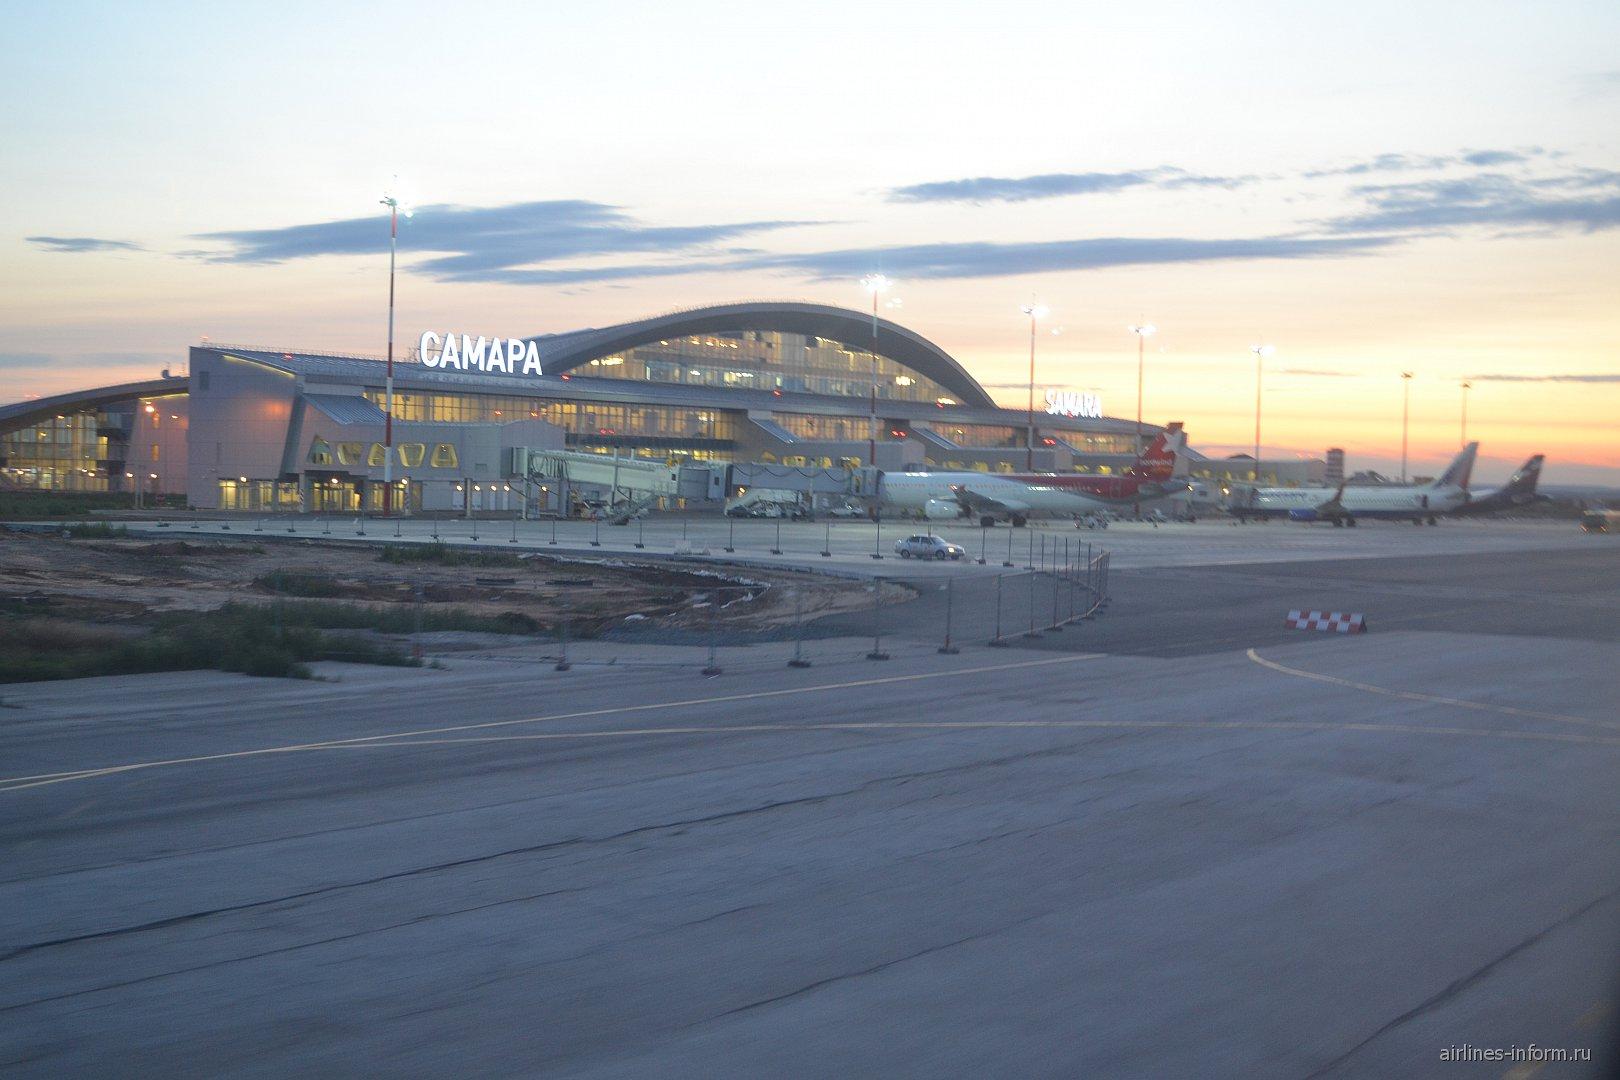 Новый терминал аэропорта Самара Курумоч